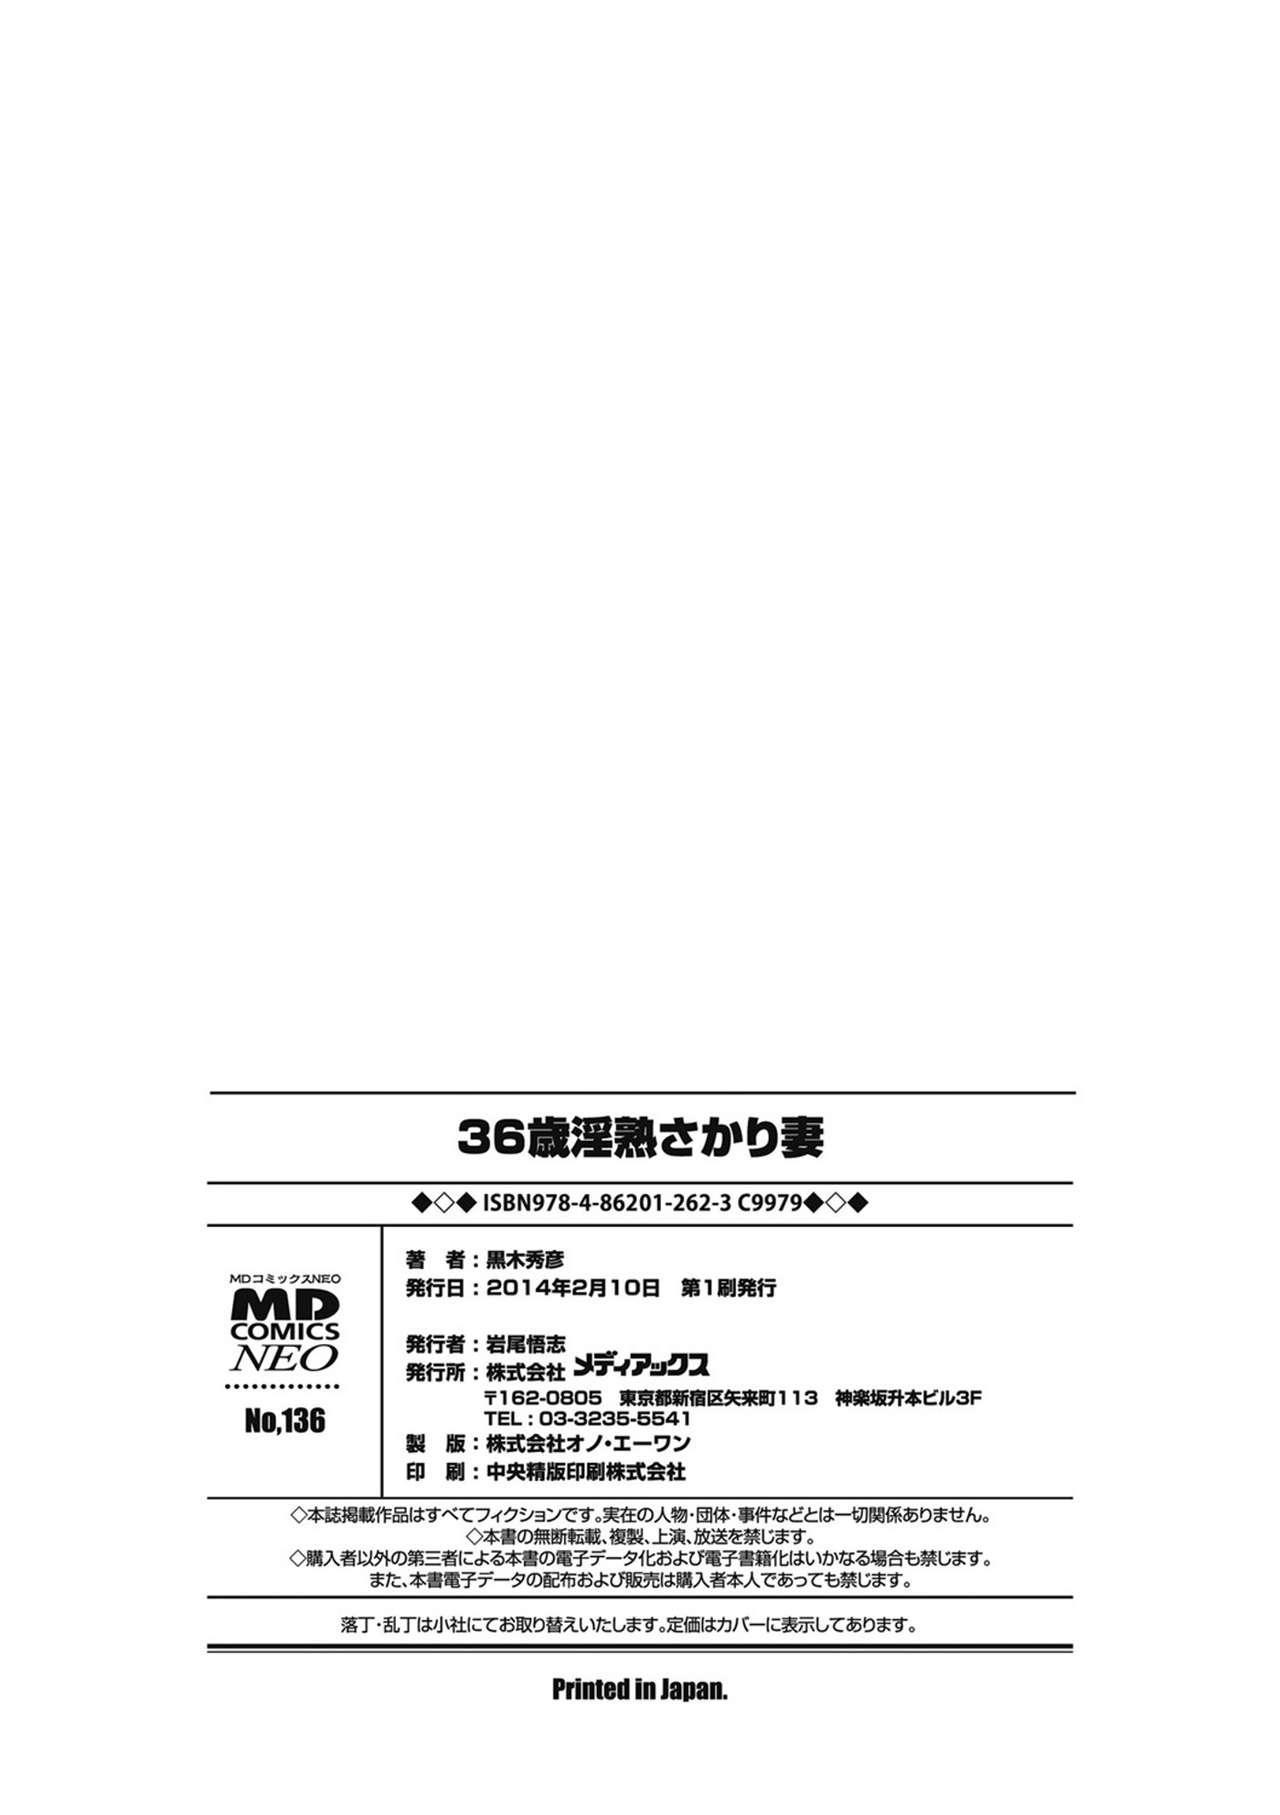 [Kuroki Hidehiko] 36-sai Injuku Sakarizuma | 36-Year-Old Randy Mature Wife [English] {Tadanohito} [Digital] [Uncensored] 193